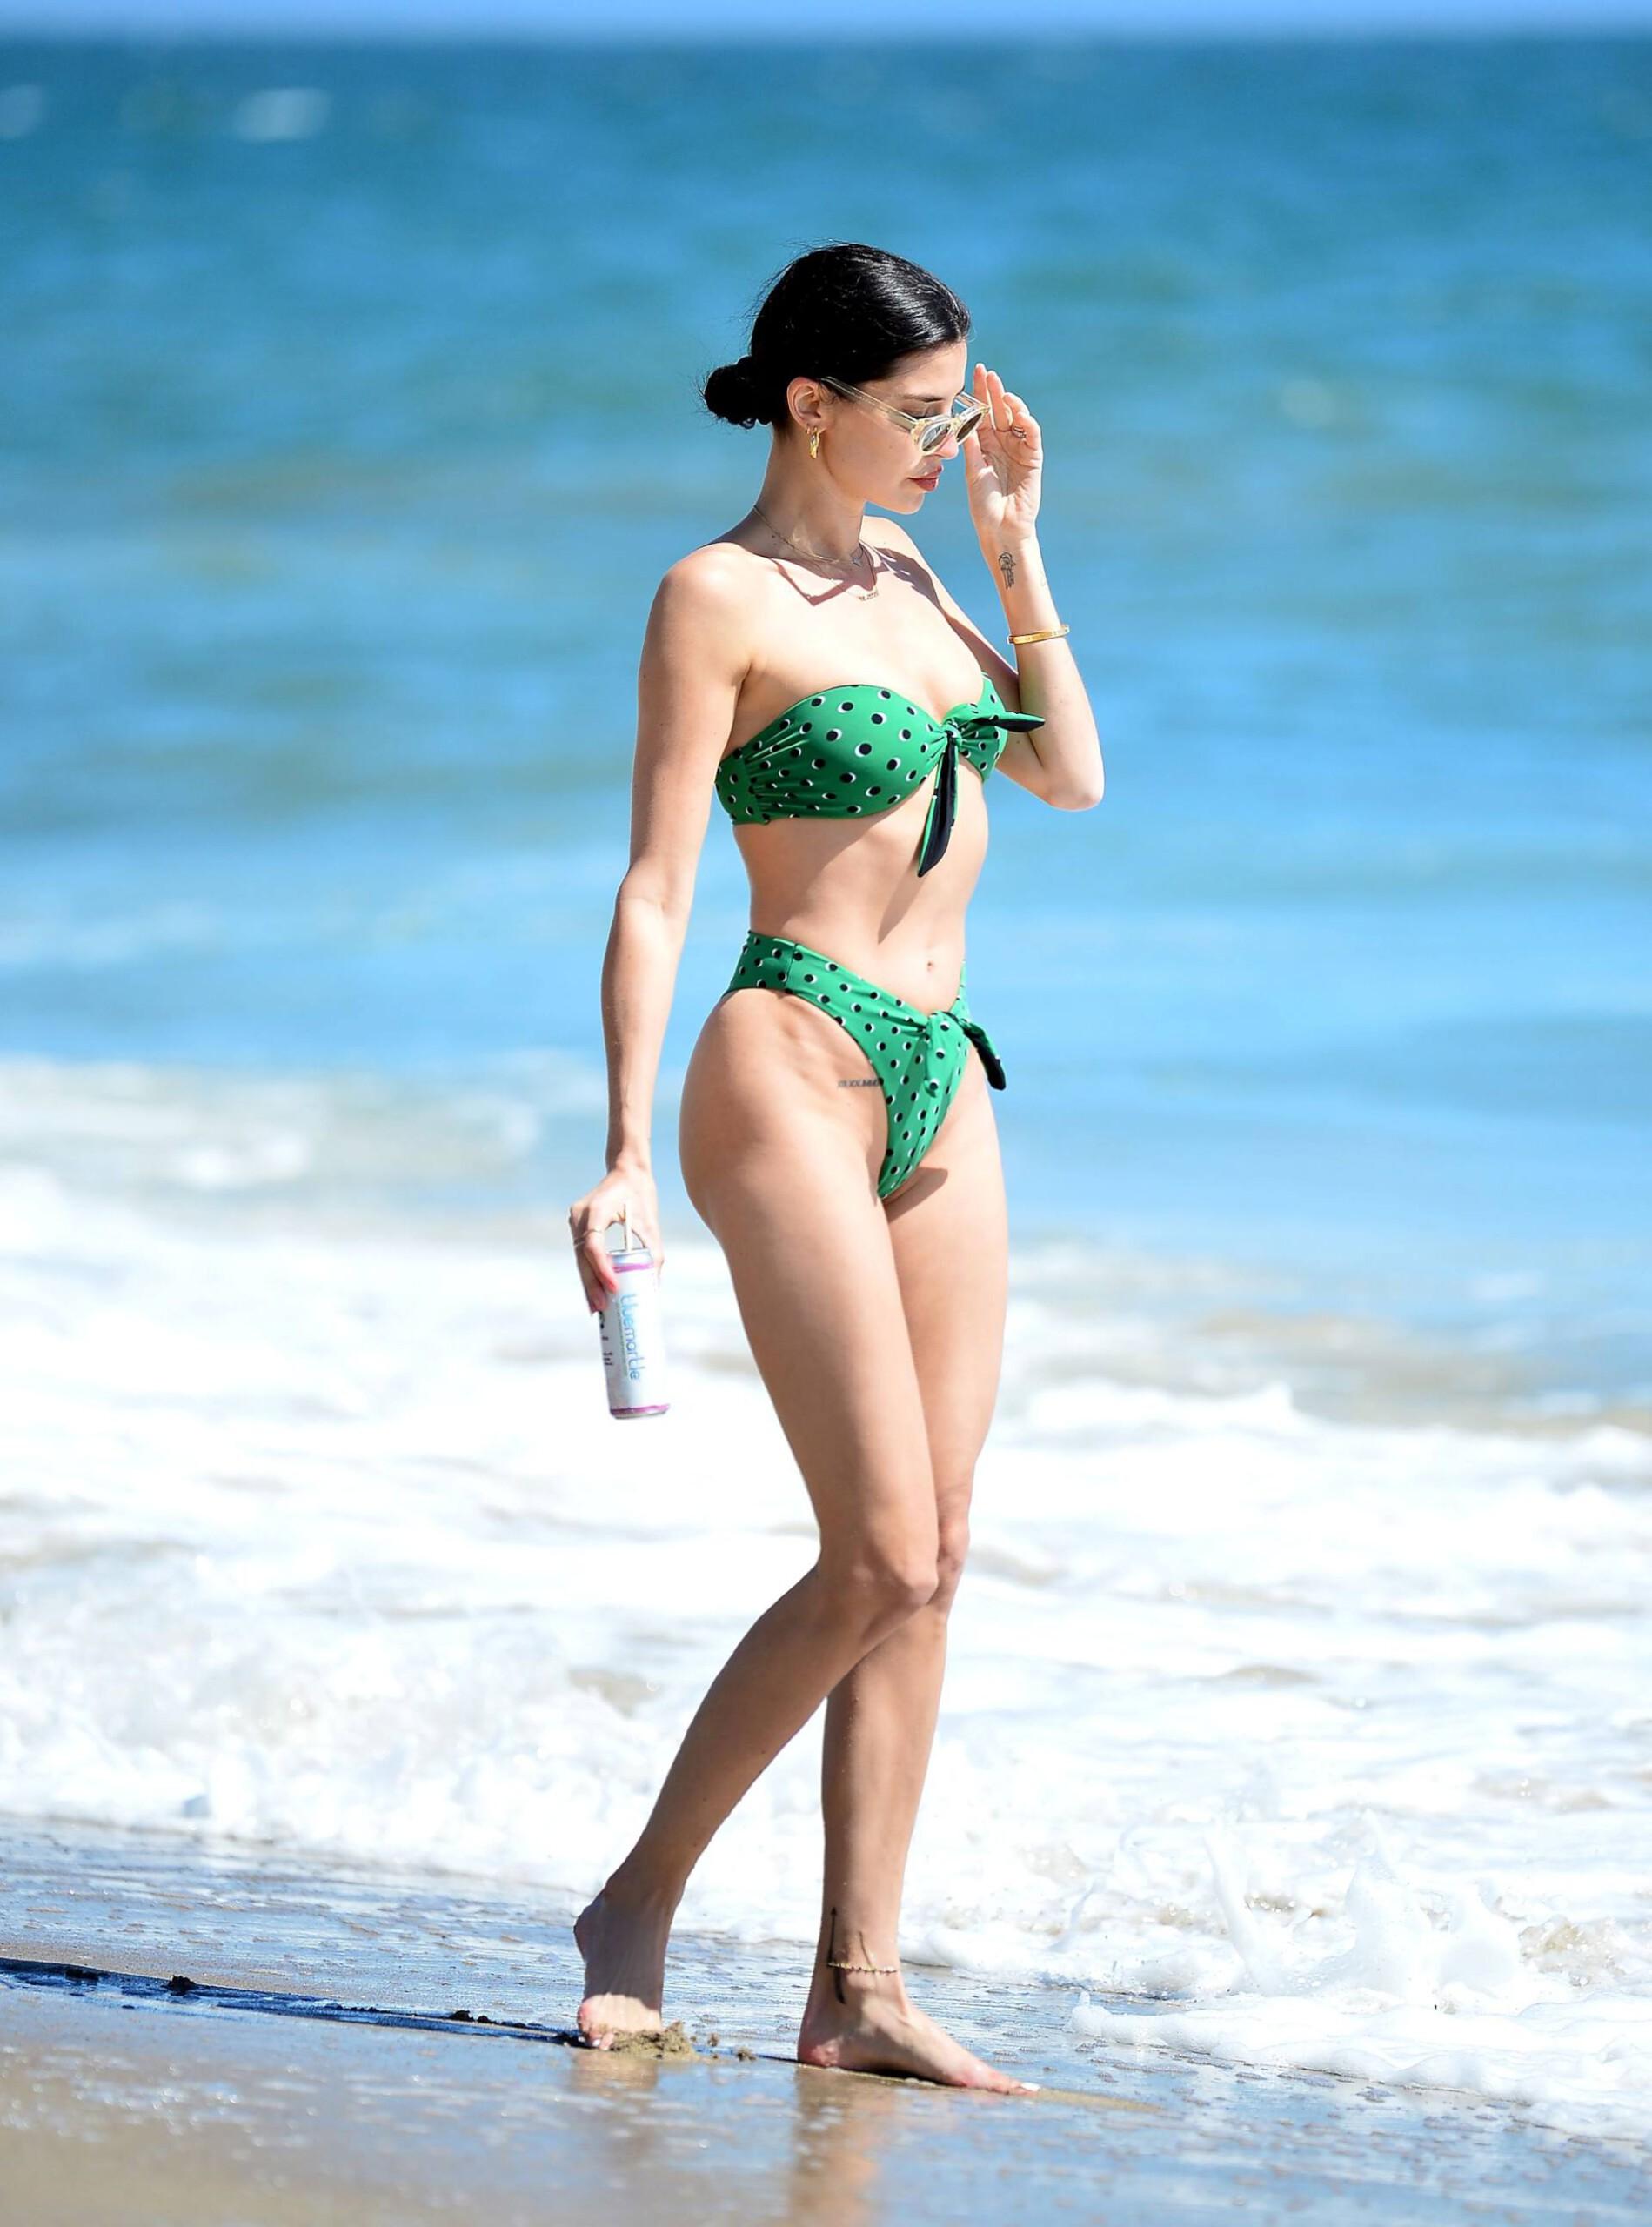 Nicole Williams – Fantastic Body In Skimpy Bikini At The Beach In Malibu 0003